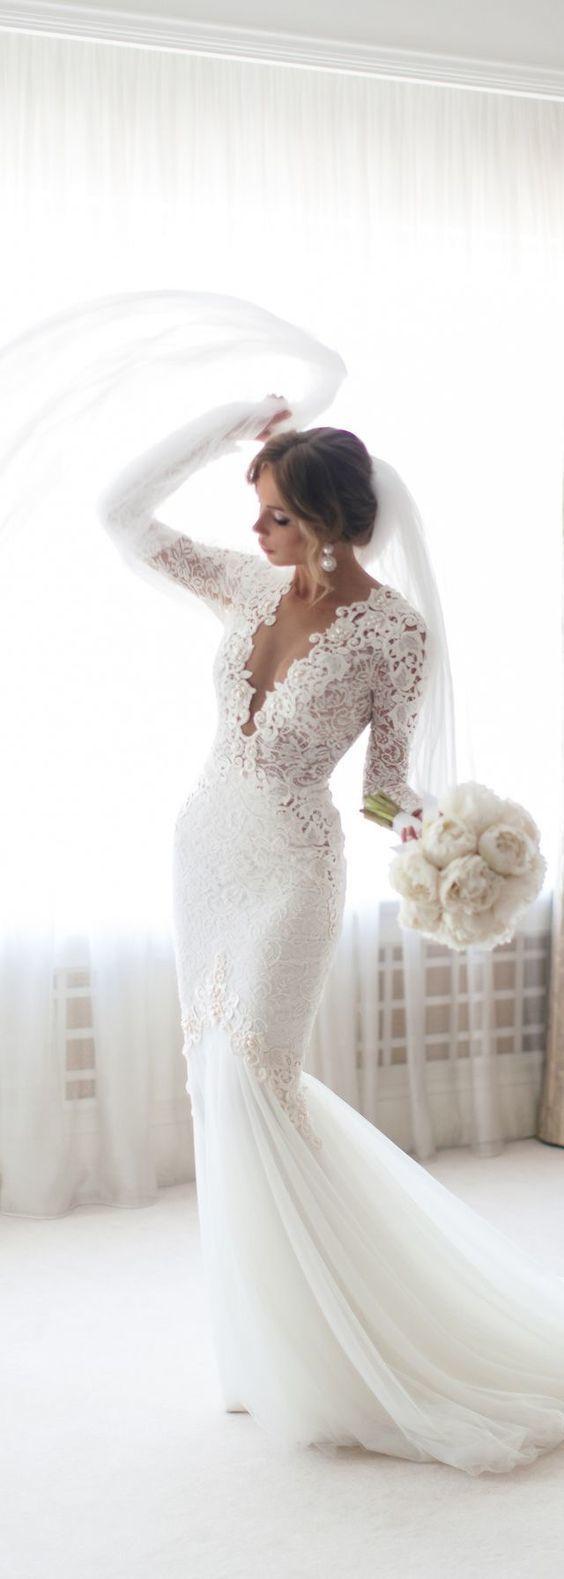 Mermaid Wedding Dress lace wedding gowns sexy wedding dresses – Karin Krepstakies